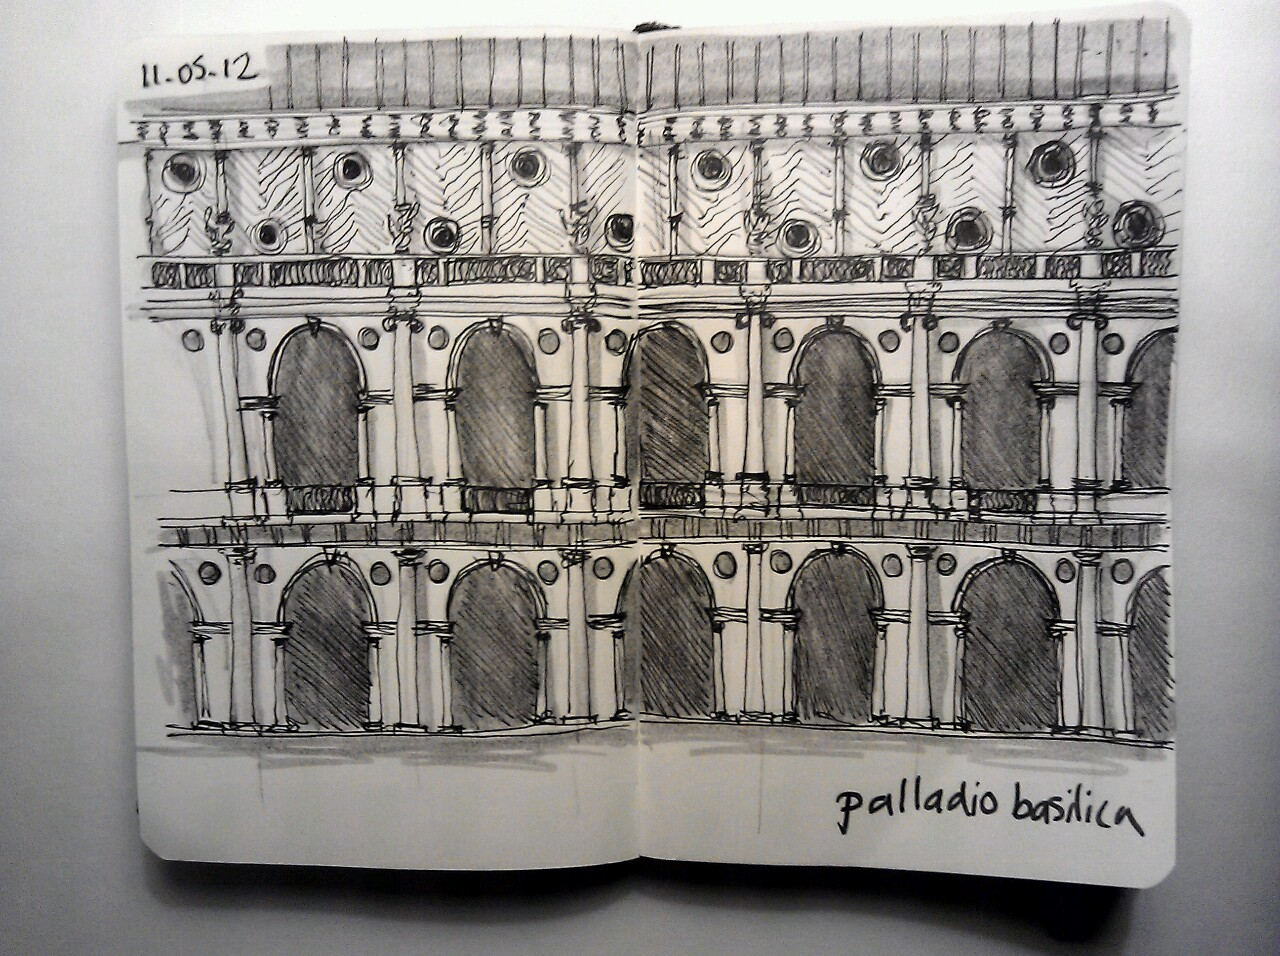 365 drawings later … day 101 … palladio basilica